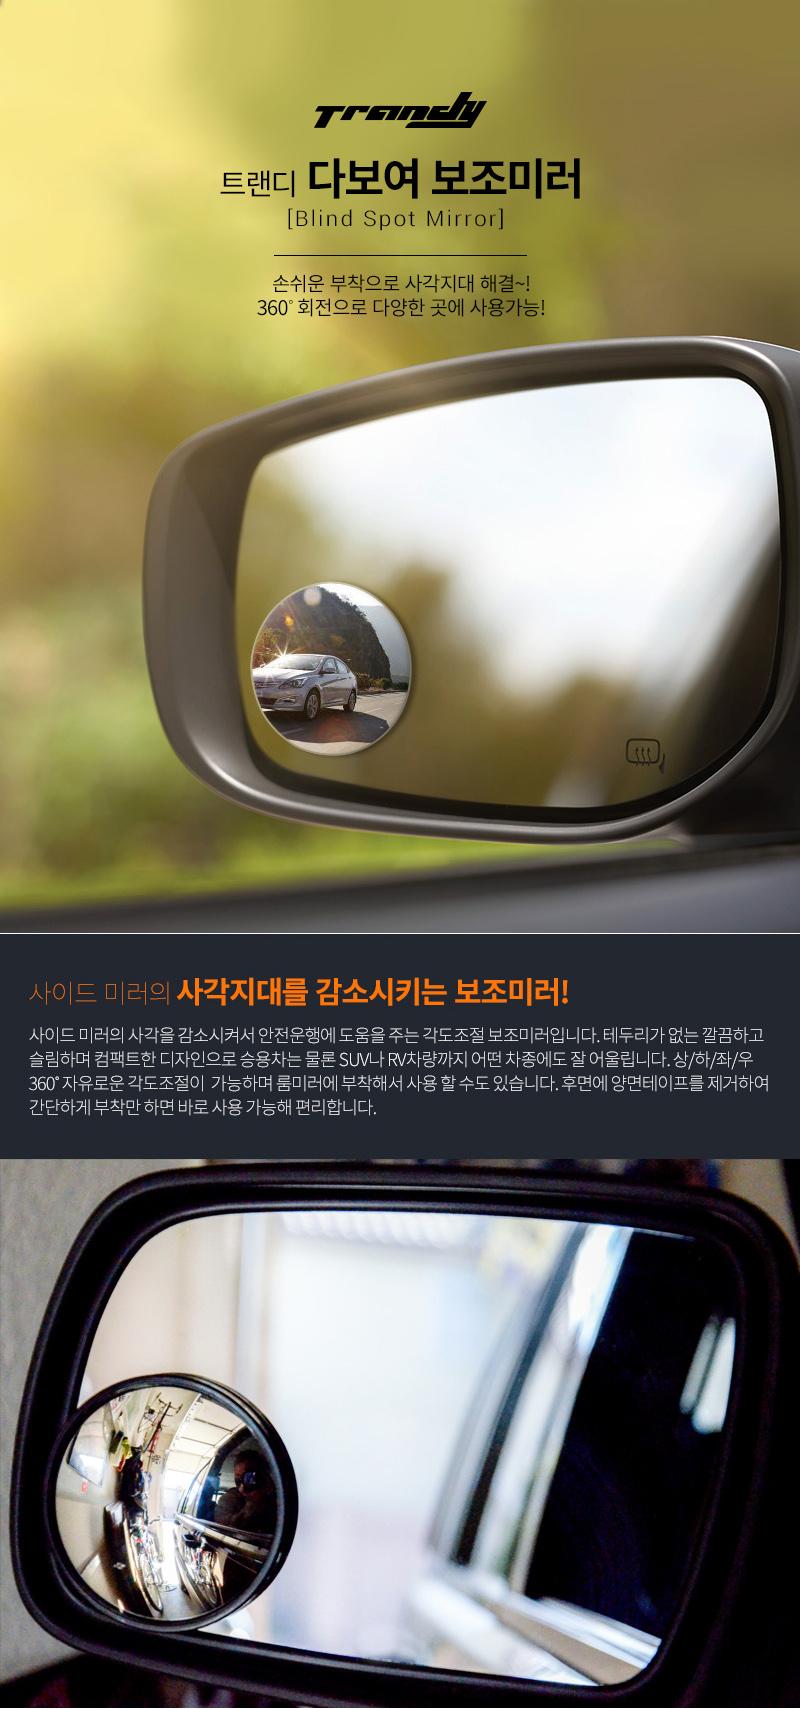 trandy_blind_spot_mirror_01_104406.jpg